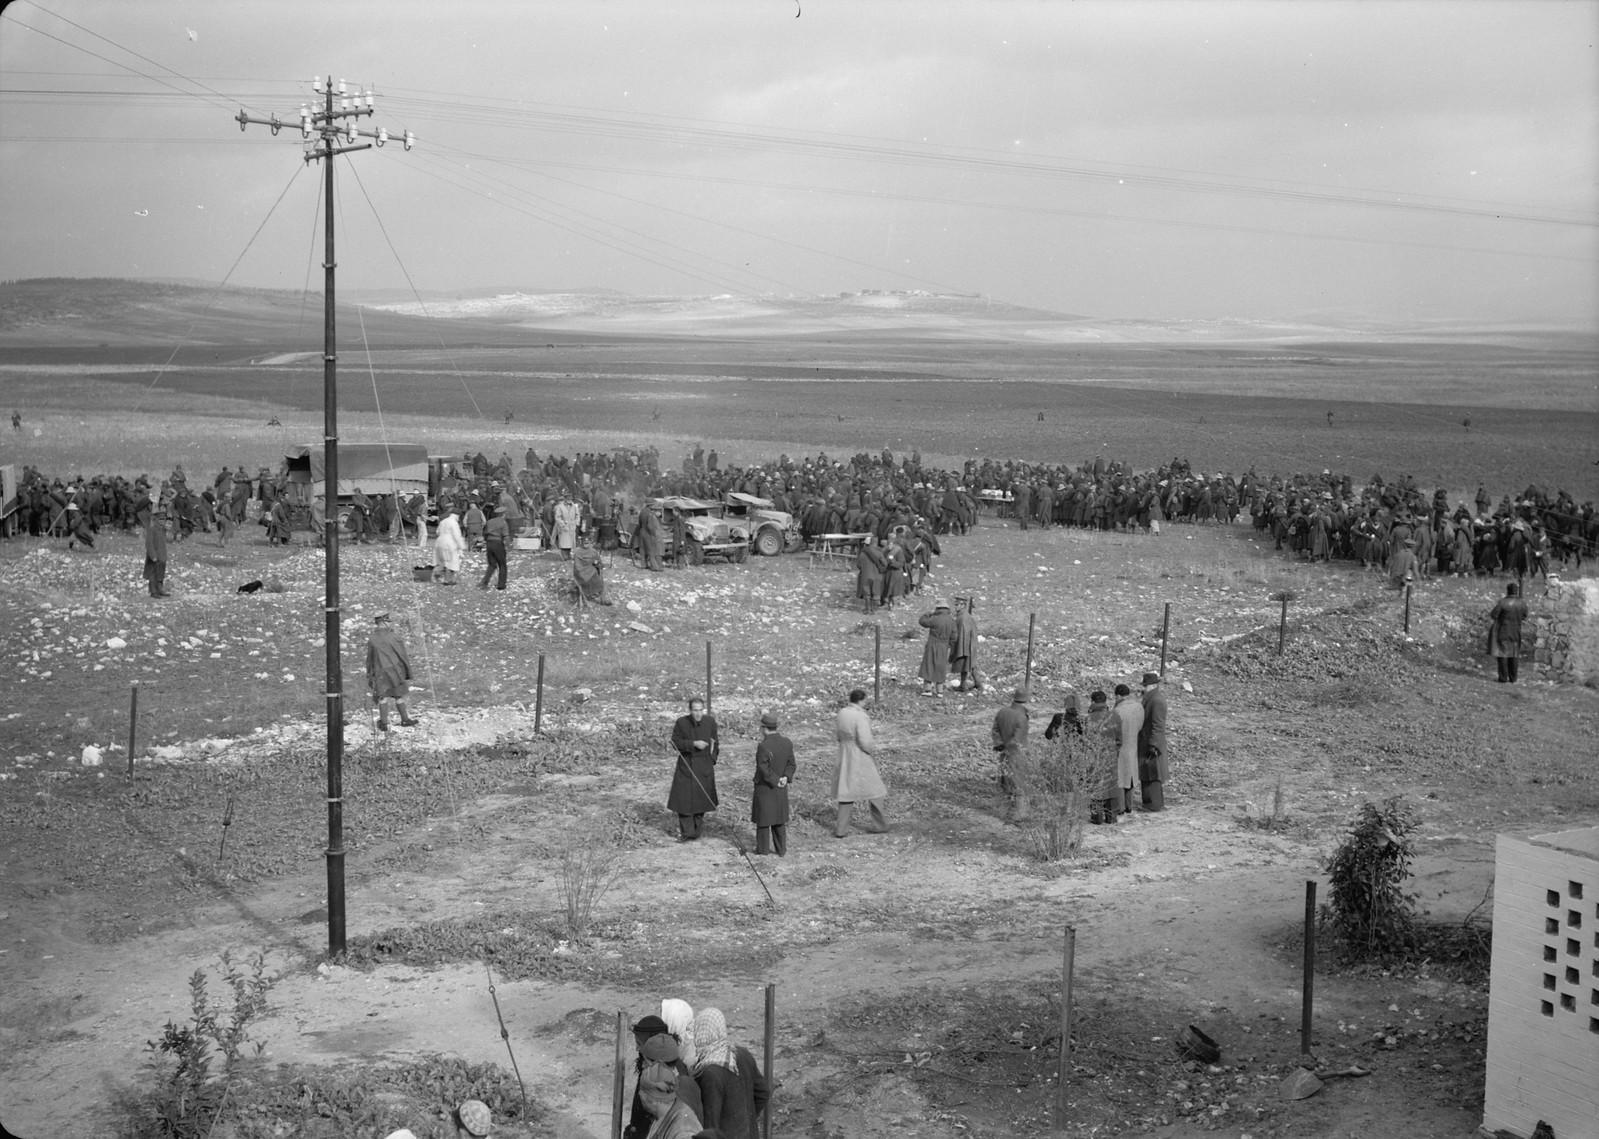 20. Панорама раздачи пищи итальянским пленным на станции Вади Сарар